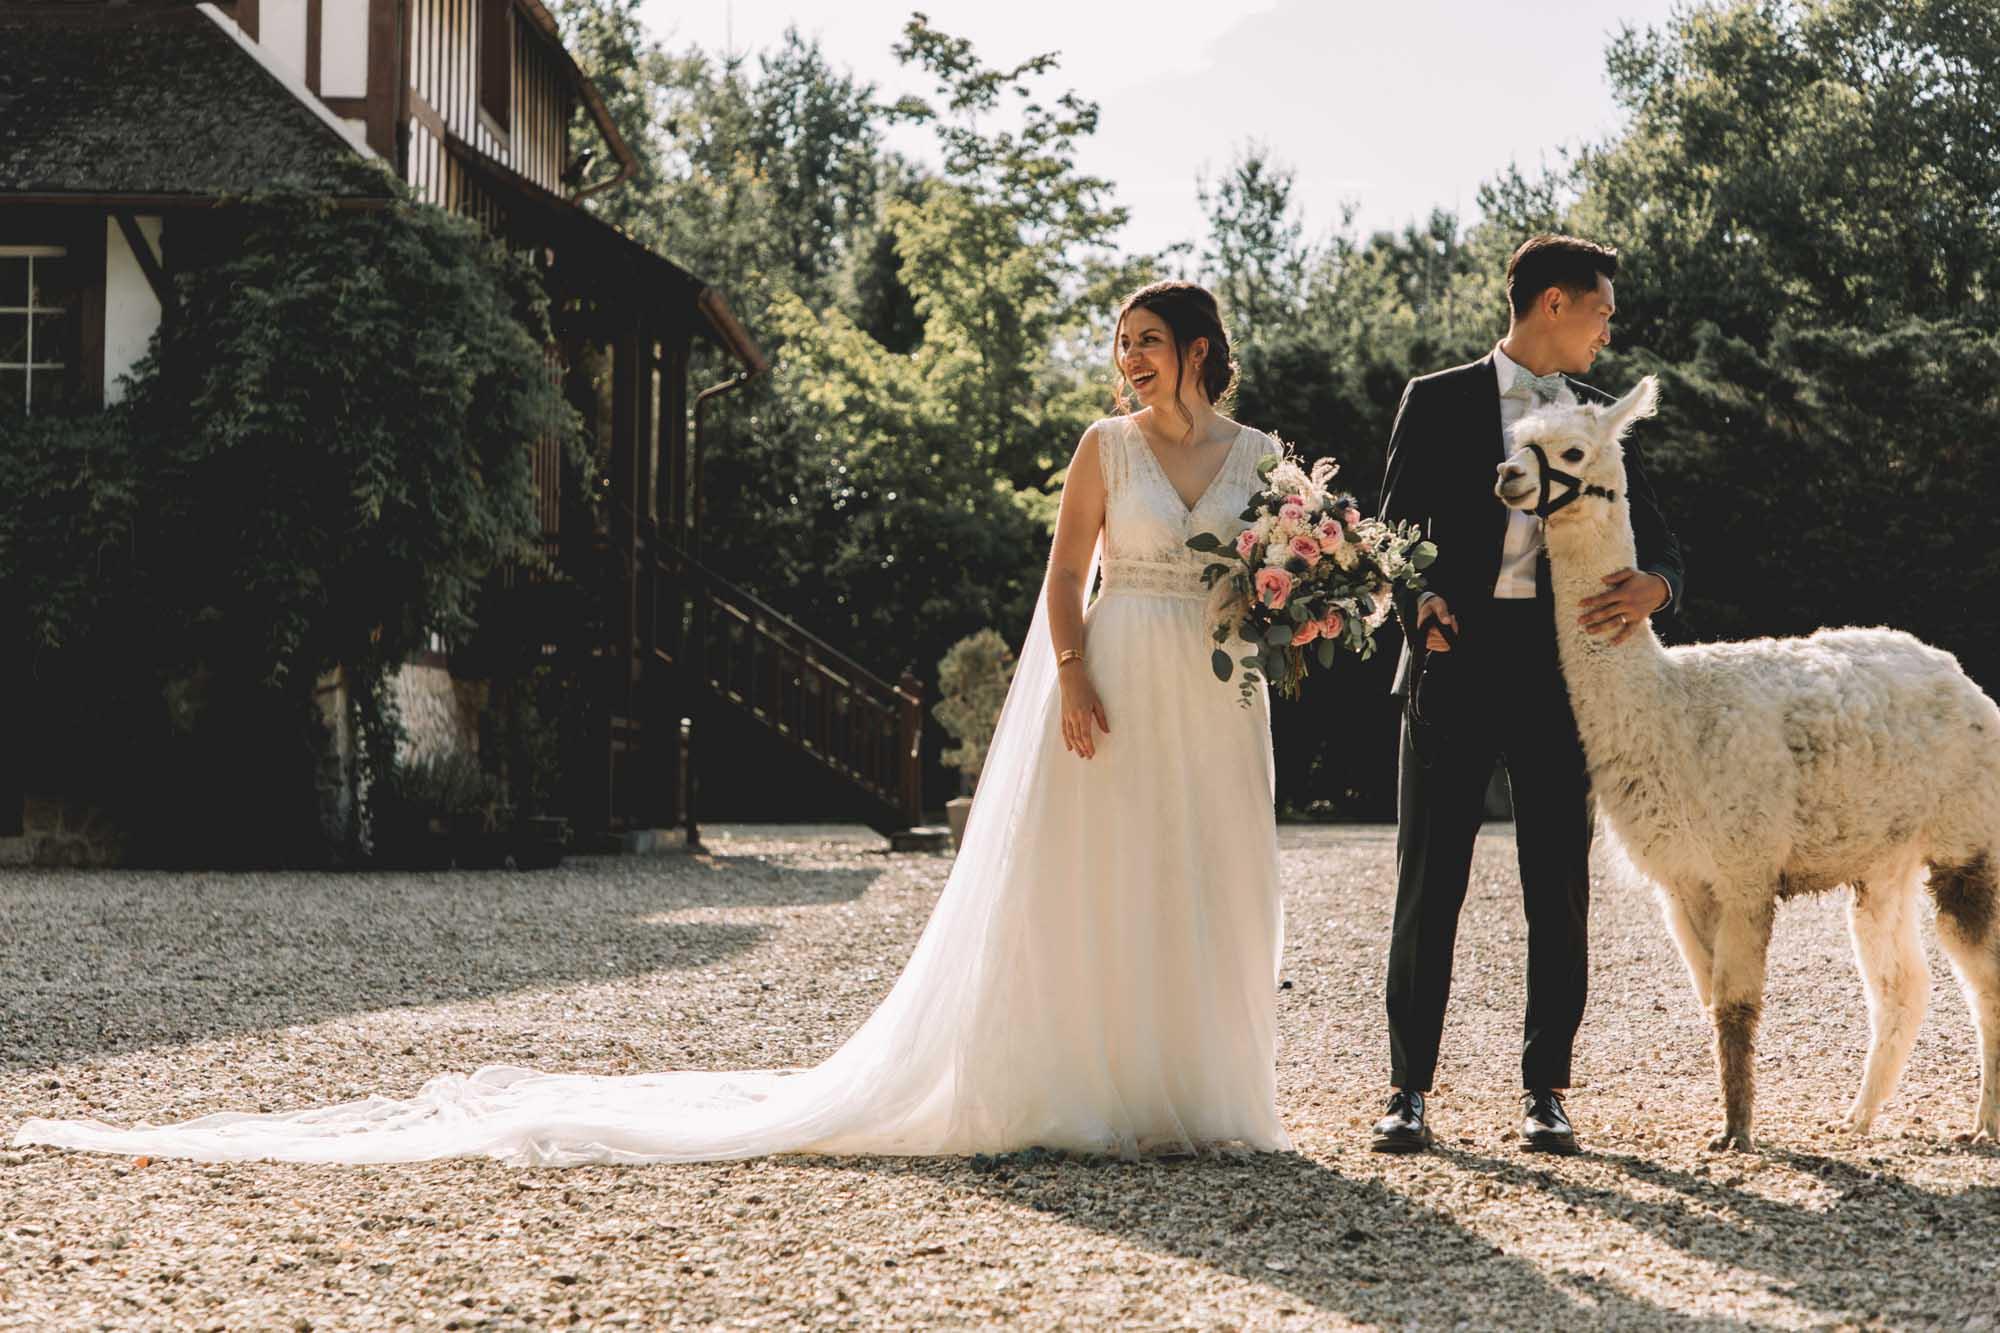 SOPHIA+THIBAUD_MANOIR SAINT HUBERT_PHOTOGRAPHE_MARIAGE_LES BANDITS-38